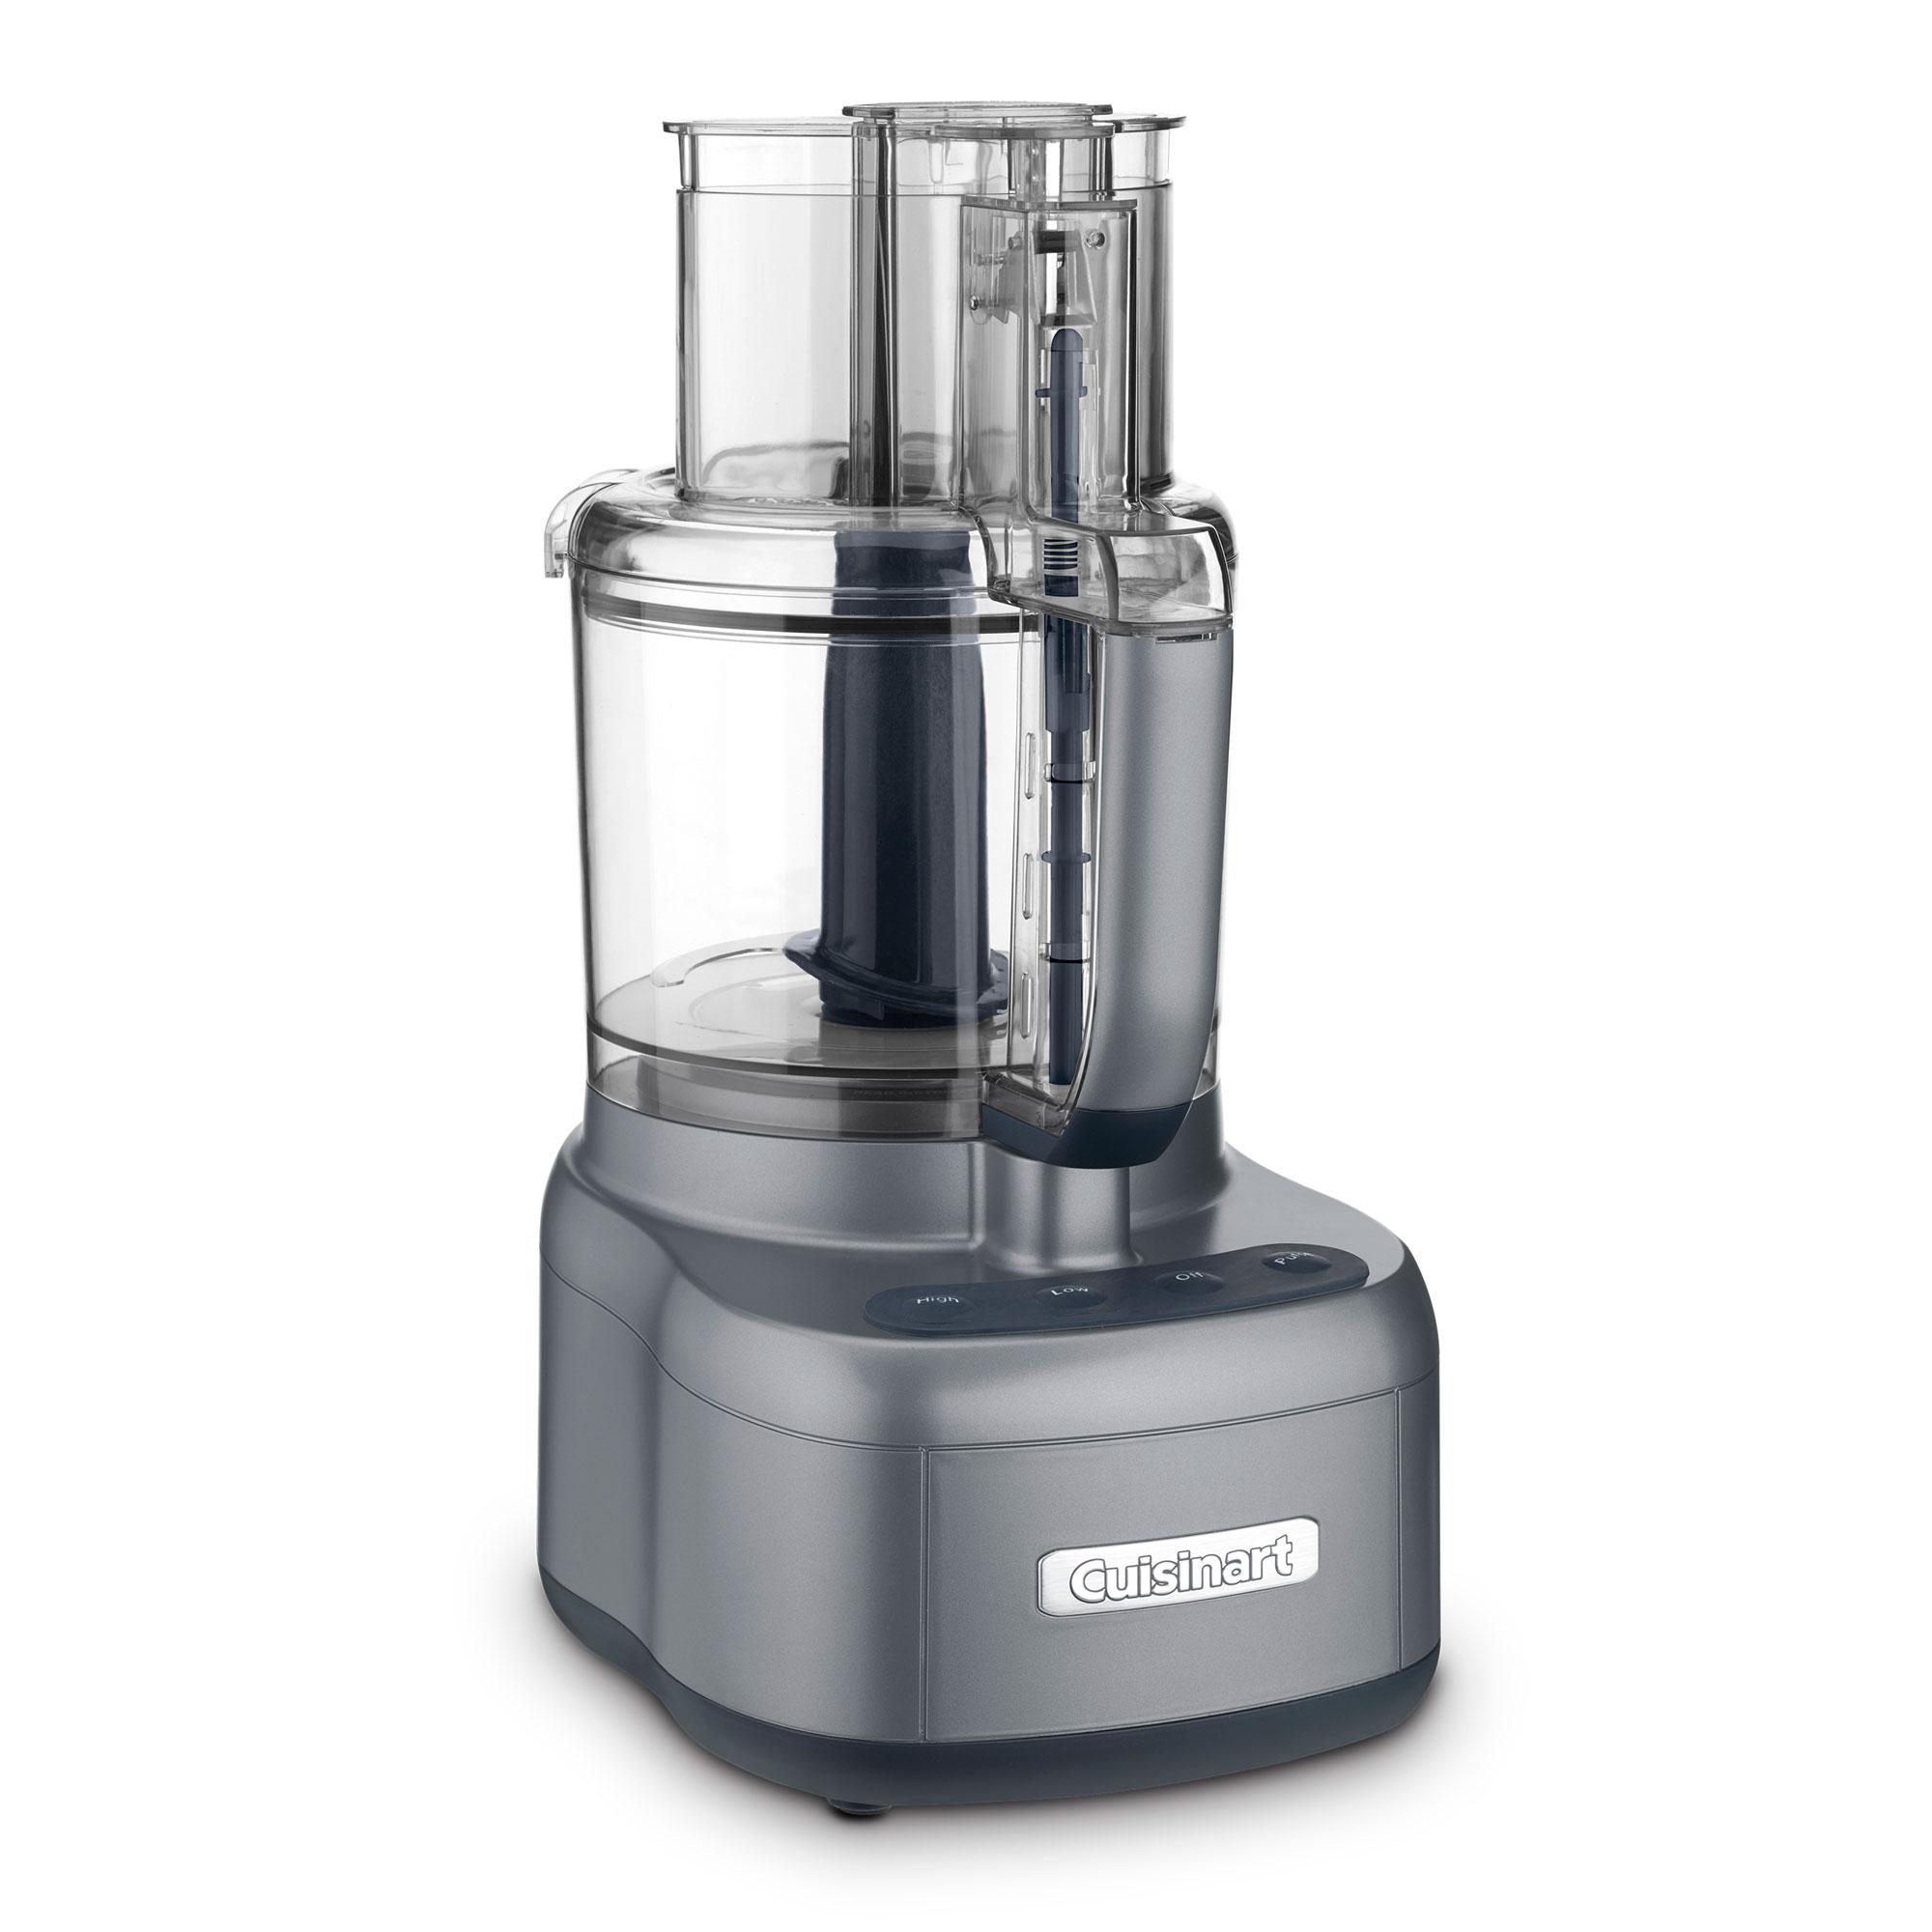 Cuisinart Elemental 11 Cup Chopper Food Processor, Gray ...